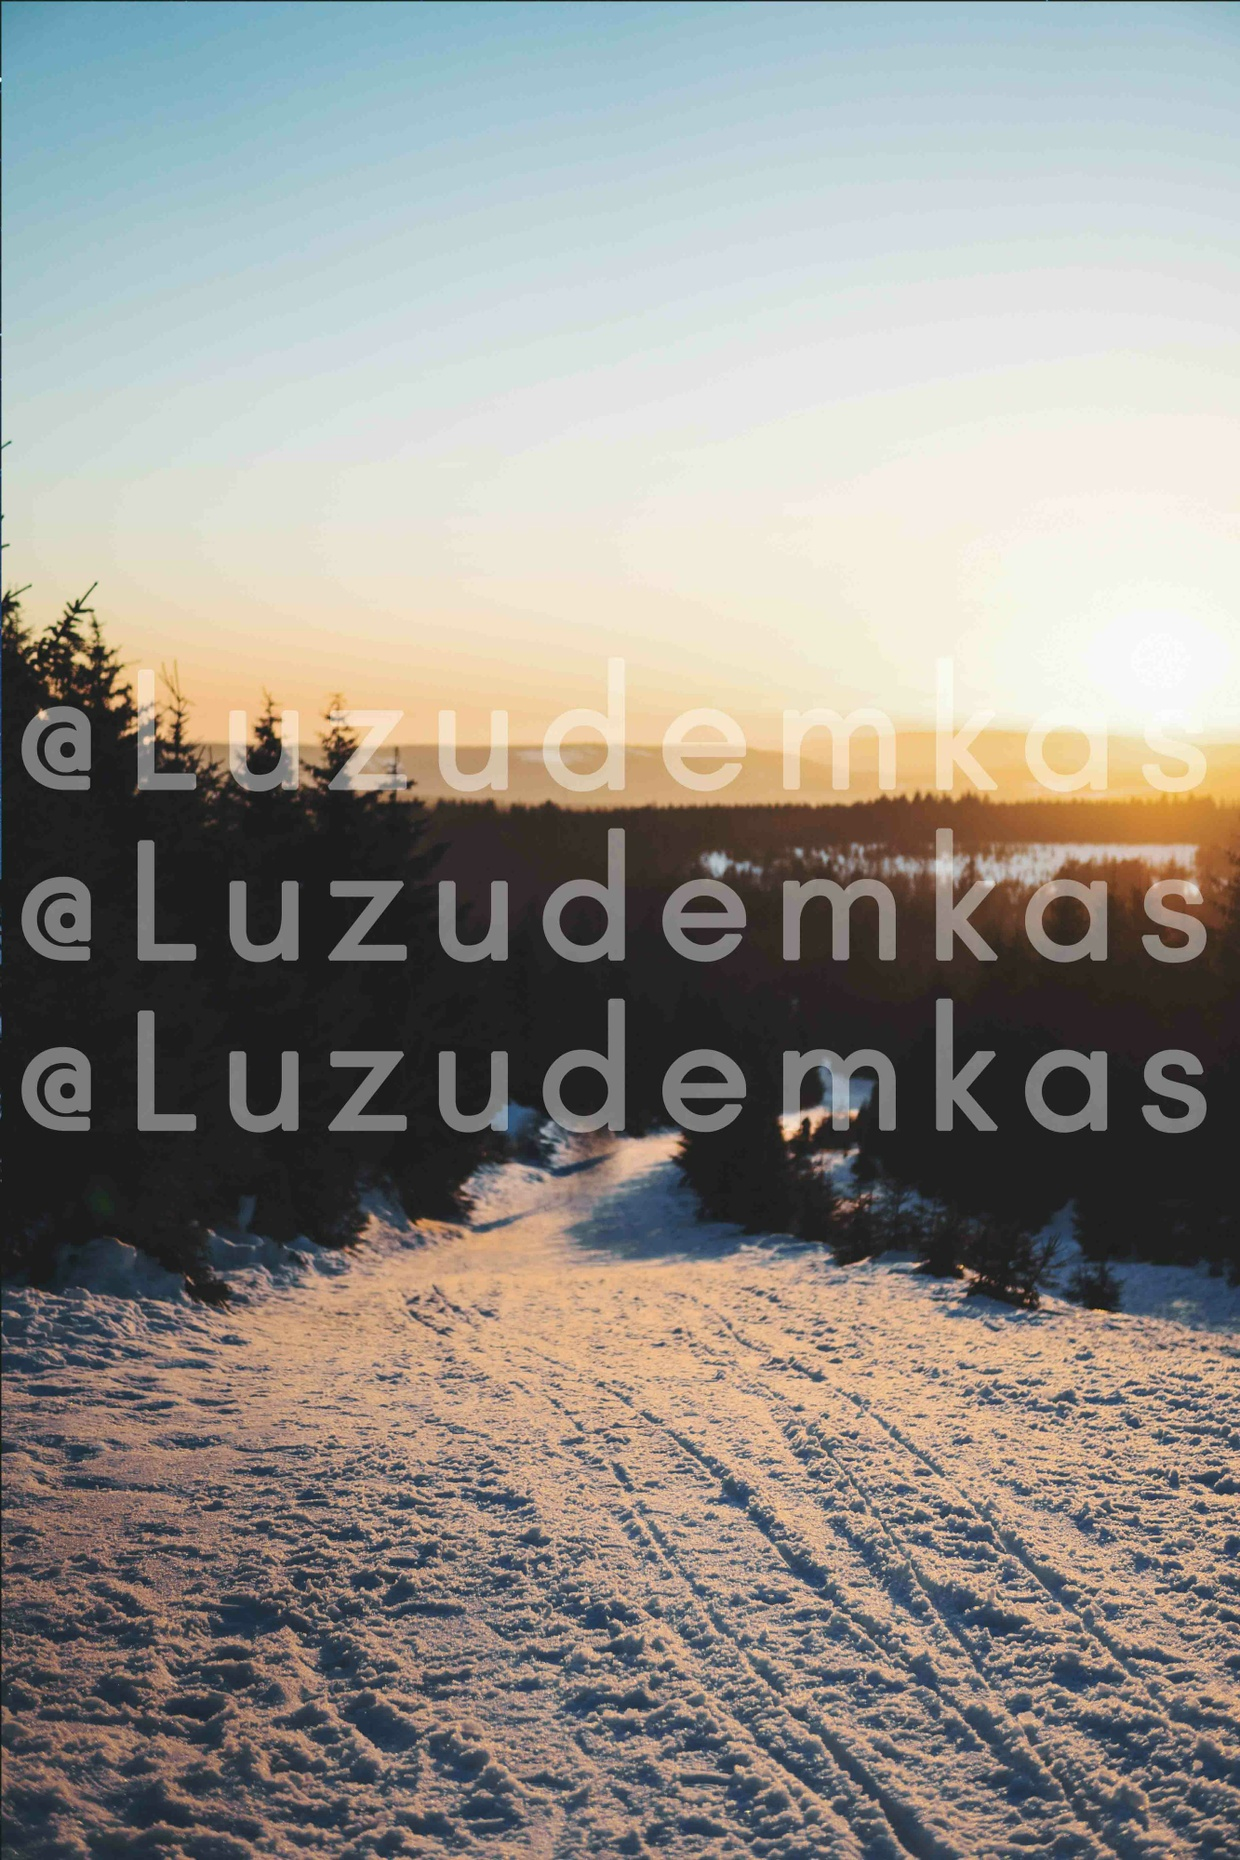 Smartphone WallpaperPack Winter 2